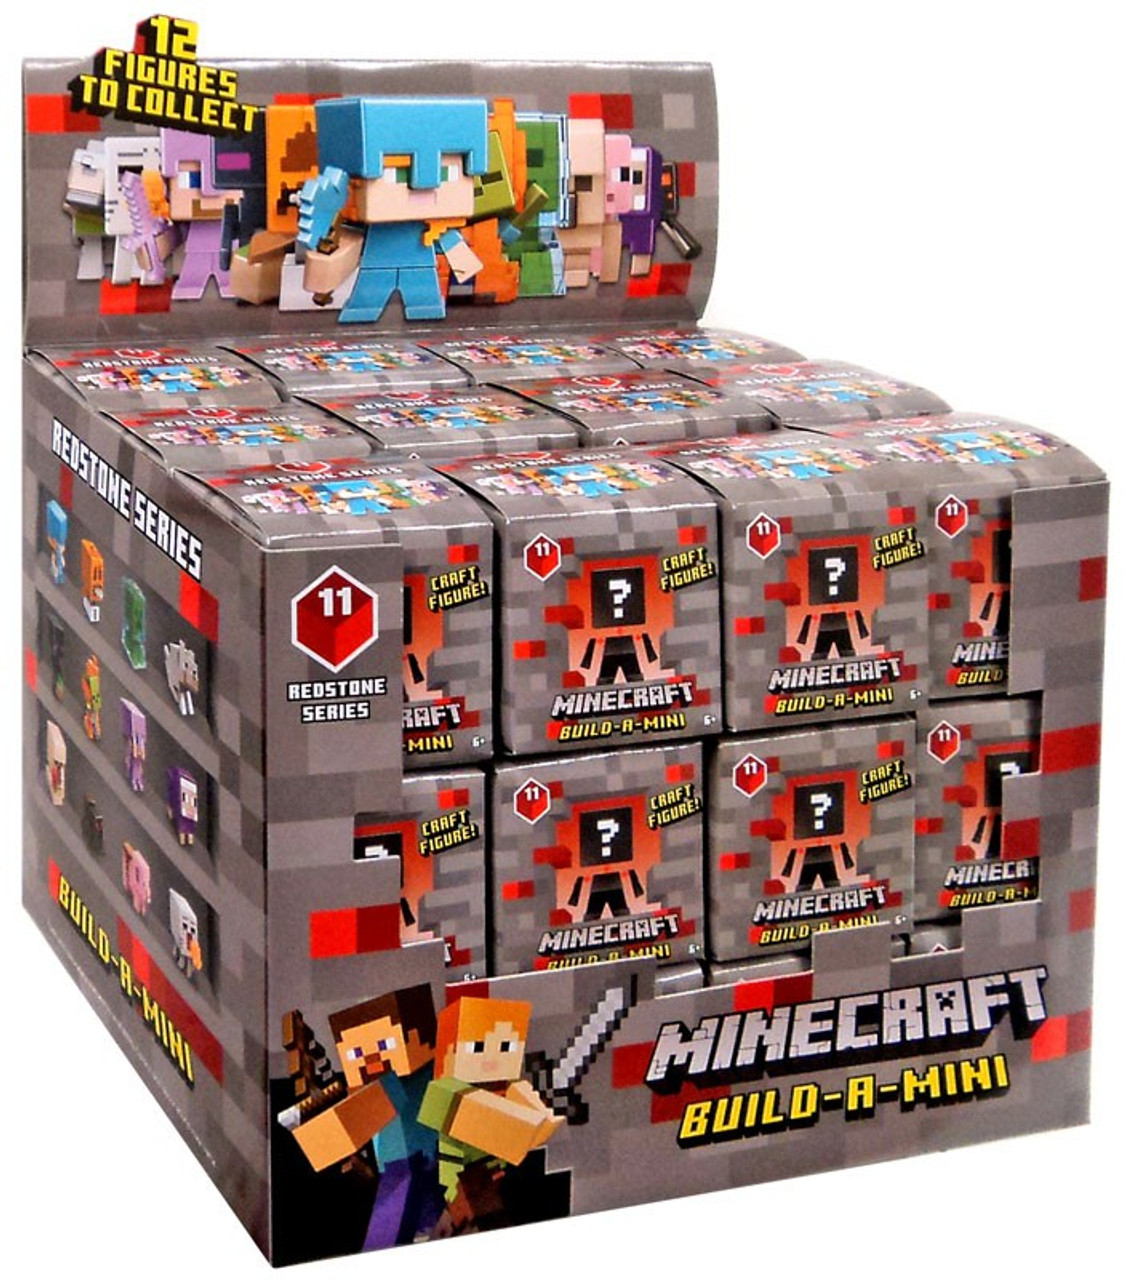 Minecraft Mystery Figure Box Series 11 Redstone